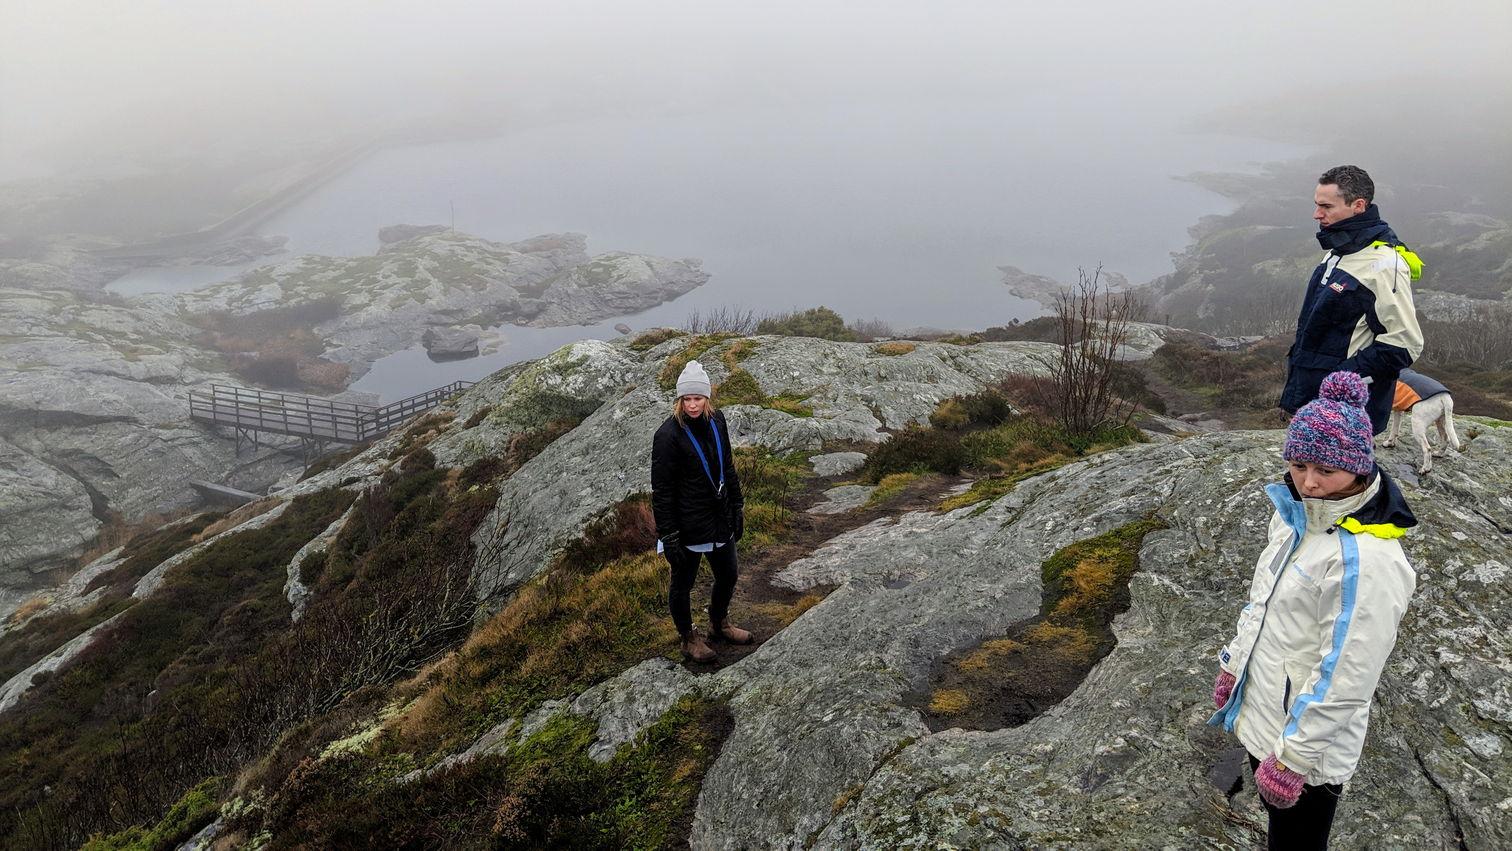 Group standing on rocks at Marstrand